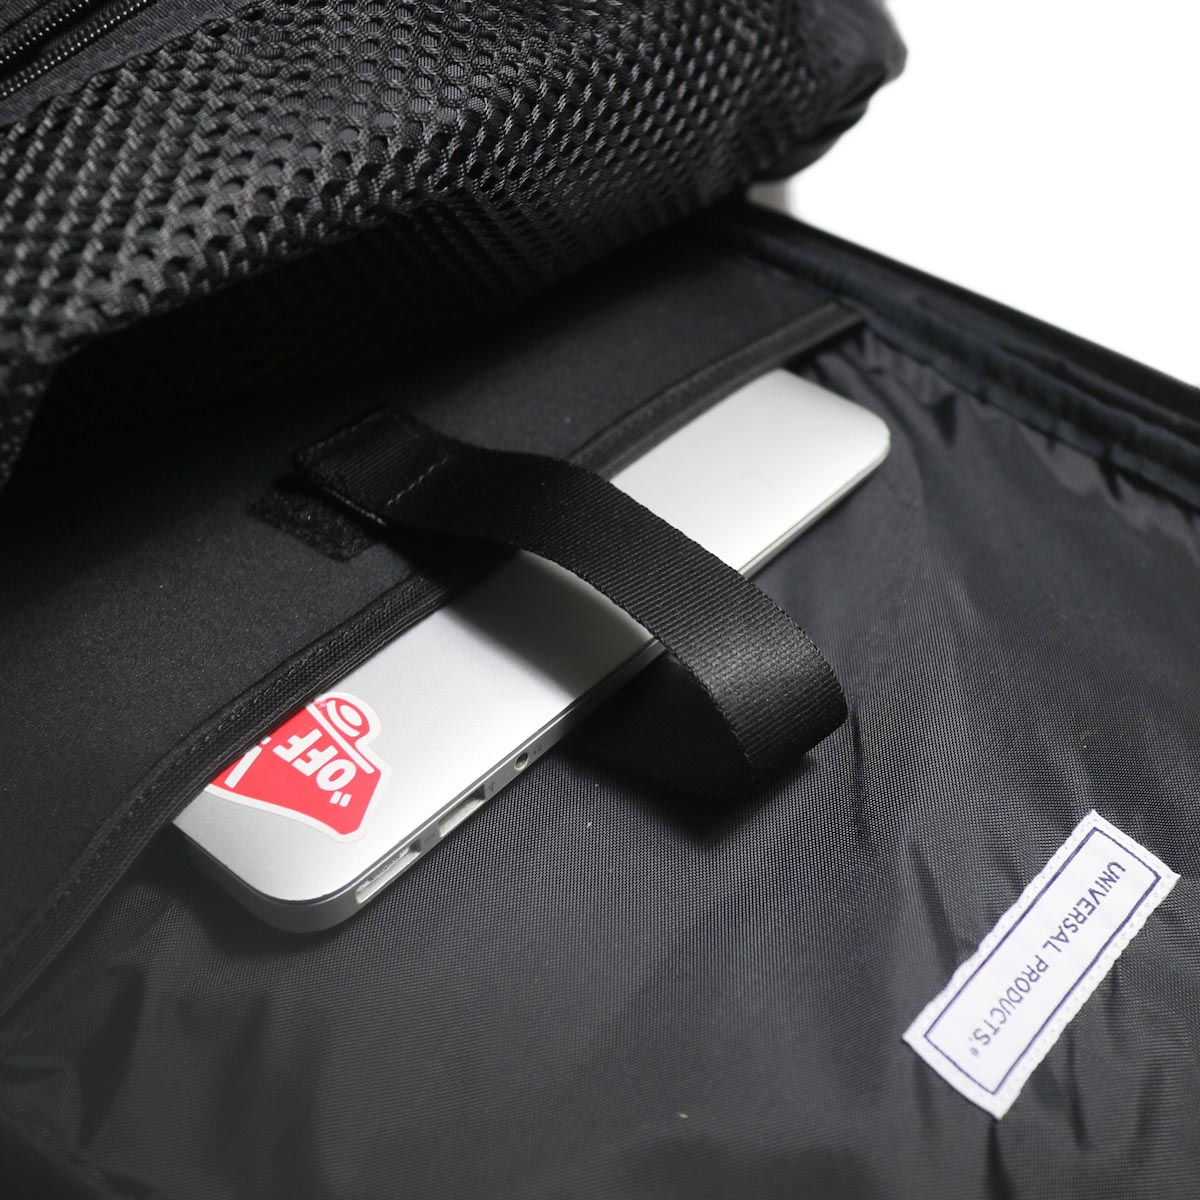 UNIVERSAL PRODUCTS / New Utility Bag -Black パソコンスリーブ